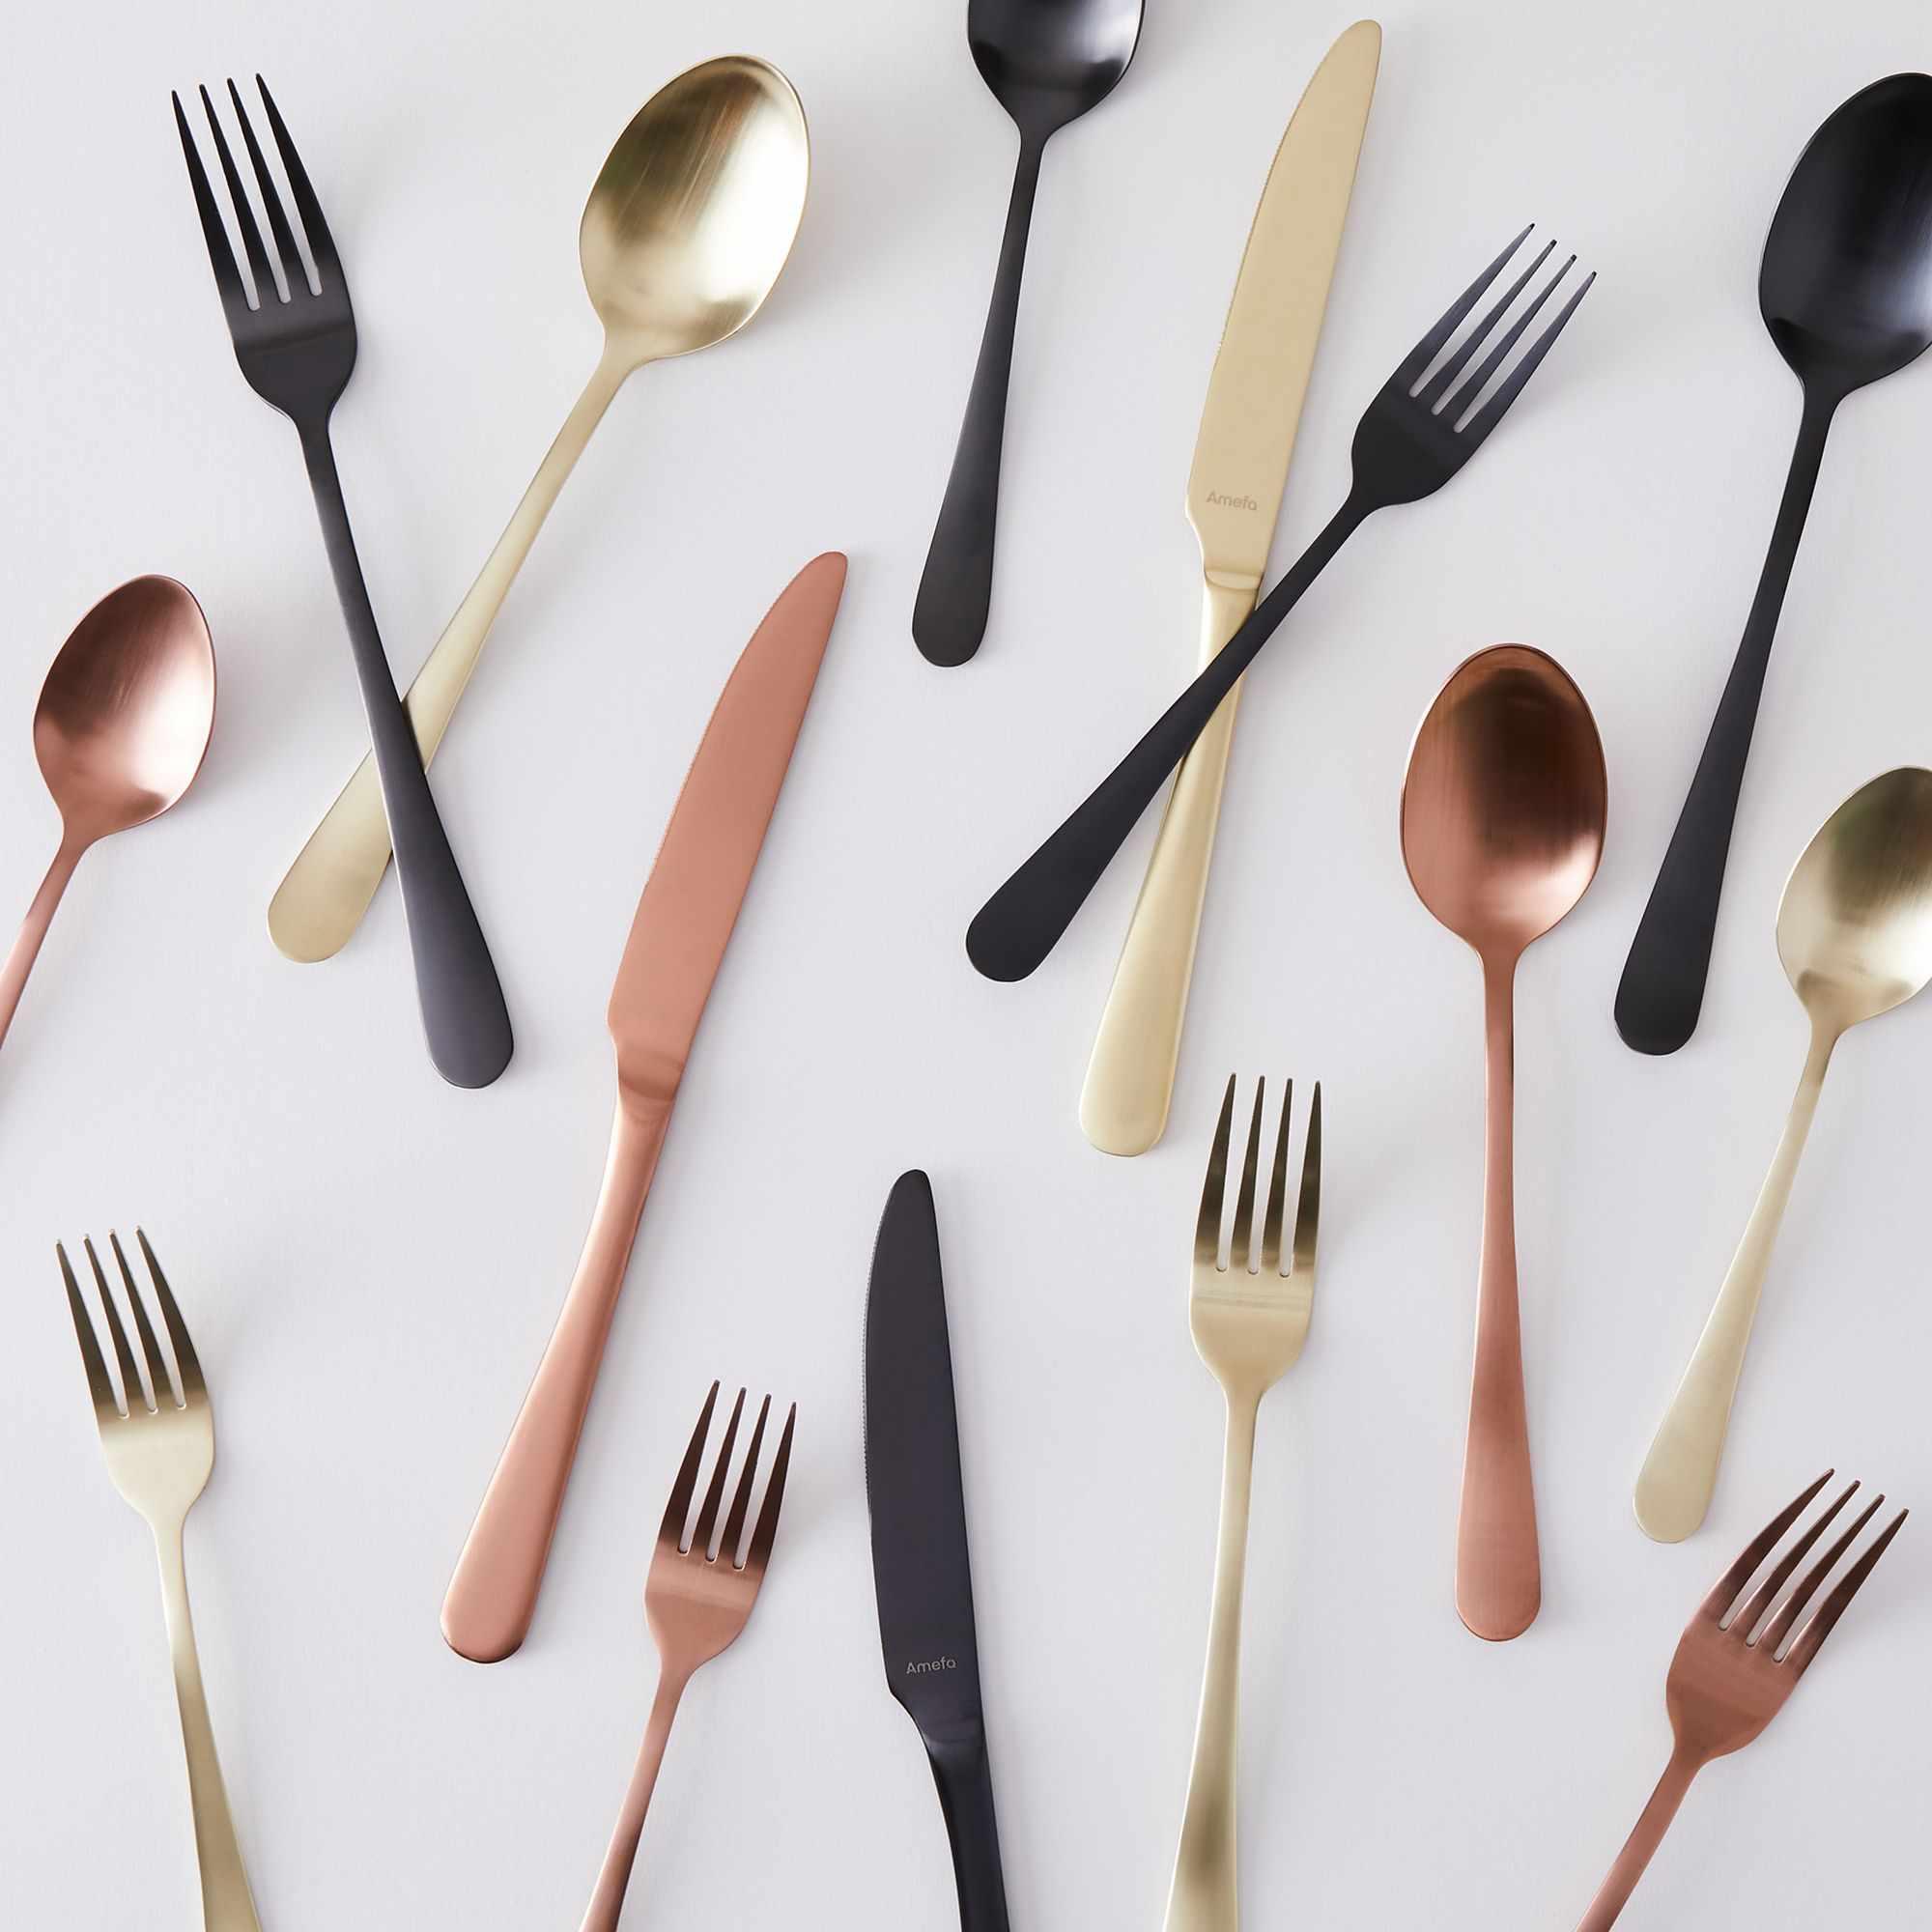 amefa-metallic-flatware-set